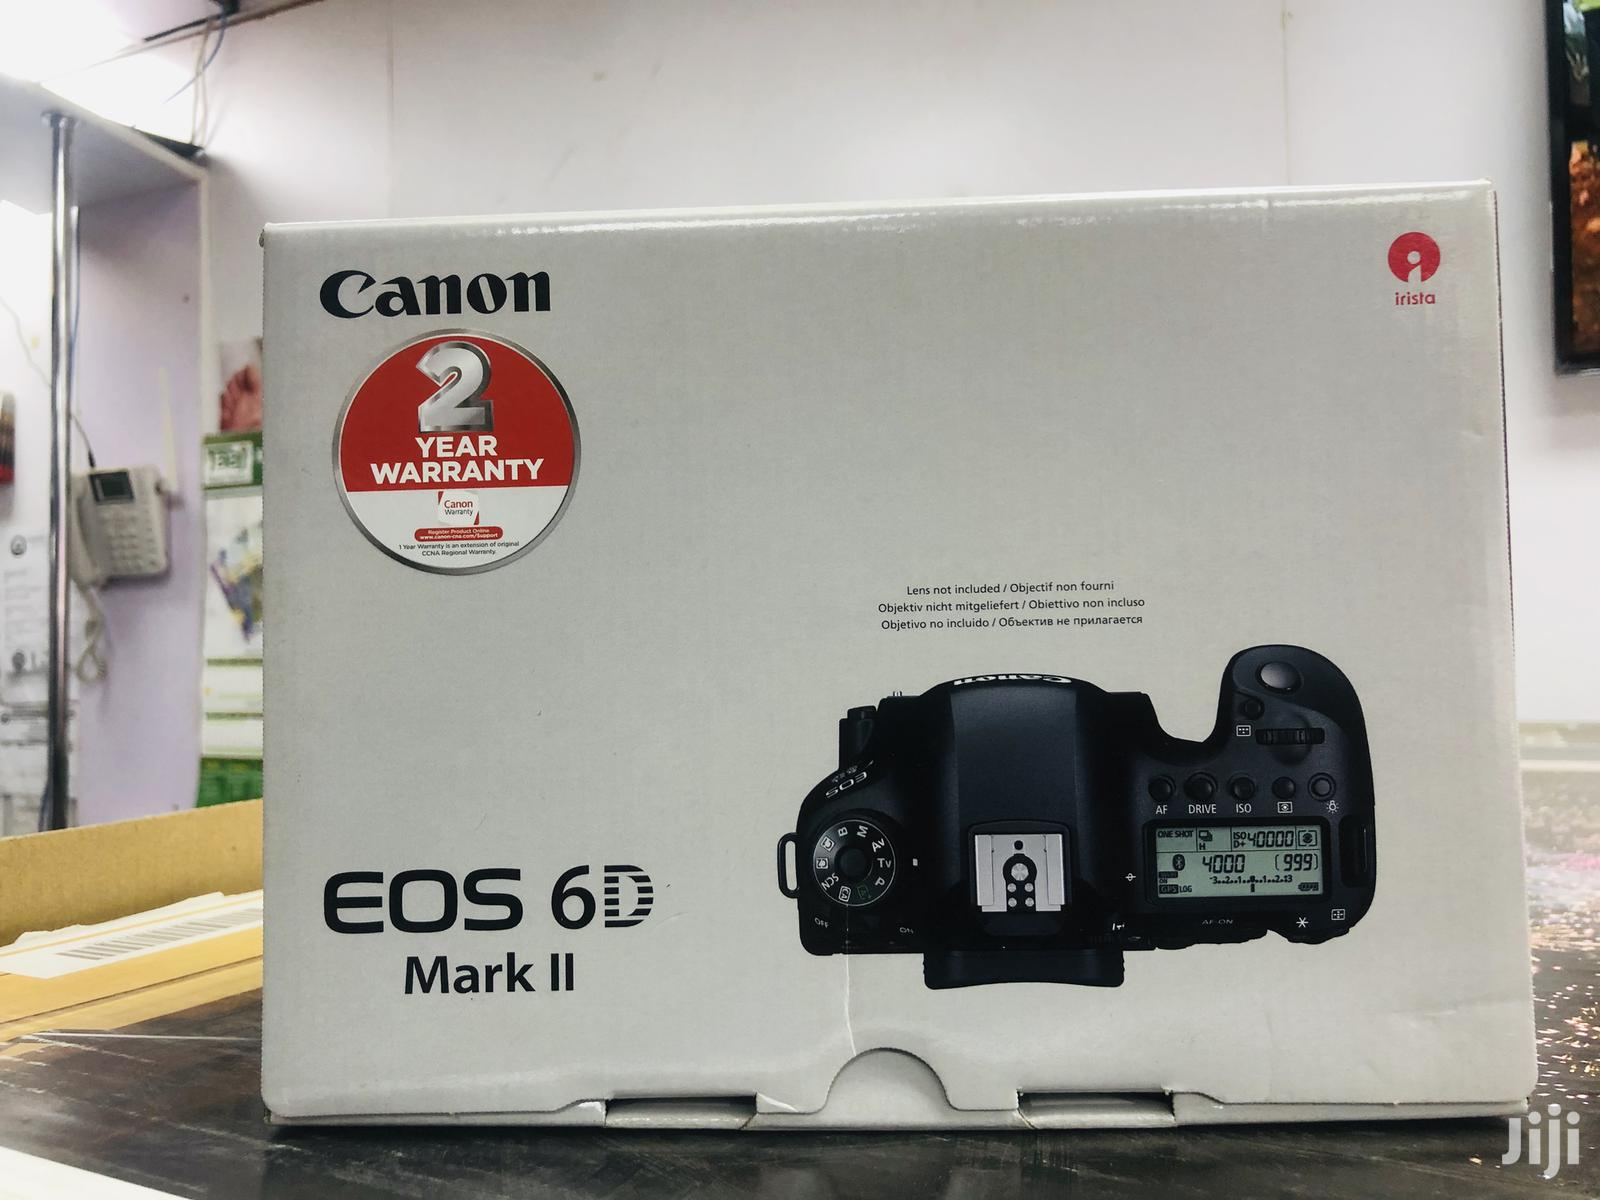 Canon EOS 6D Mark Ii | Photo & Video Cameras for sale in Nairobi Central, Nairobi, Kenya